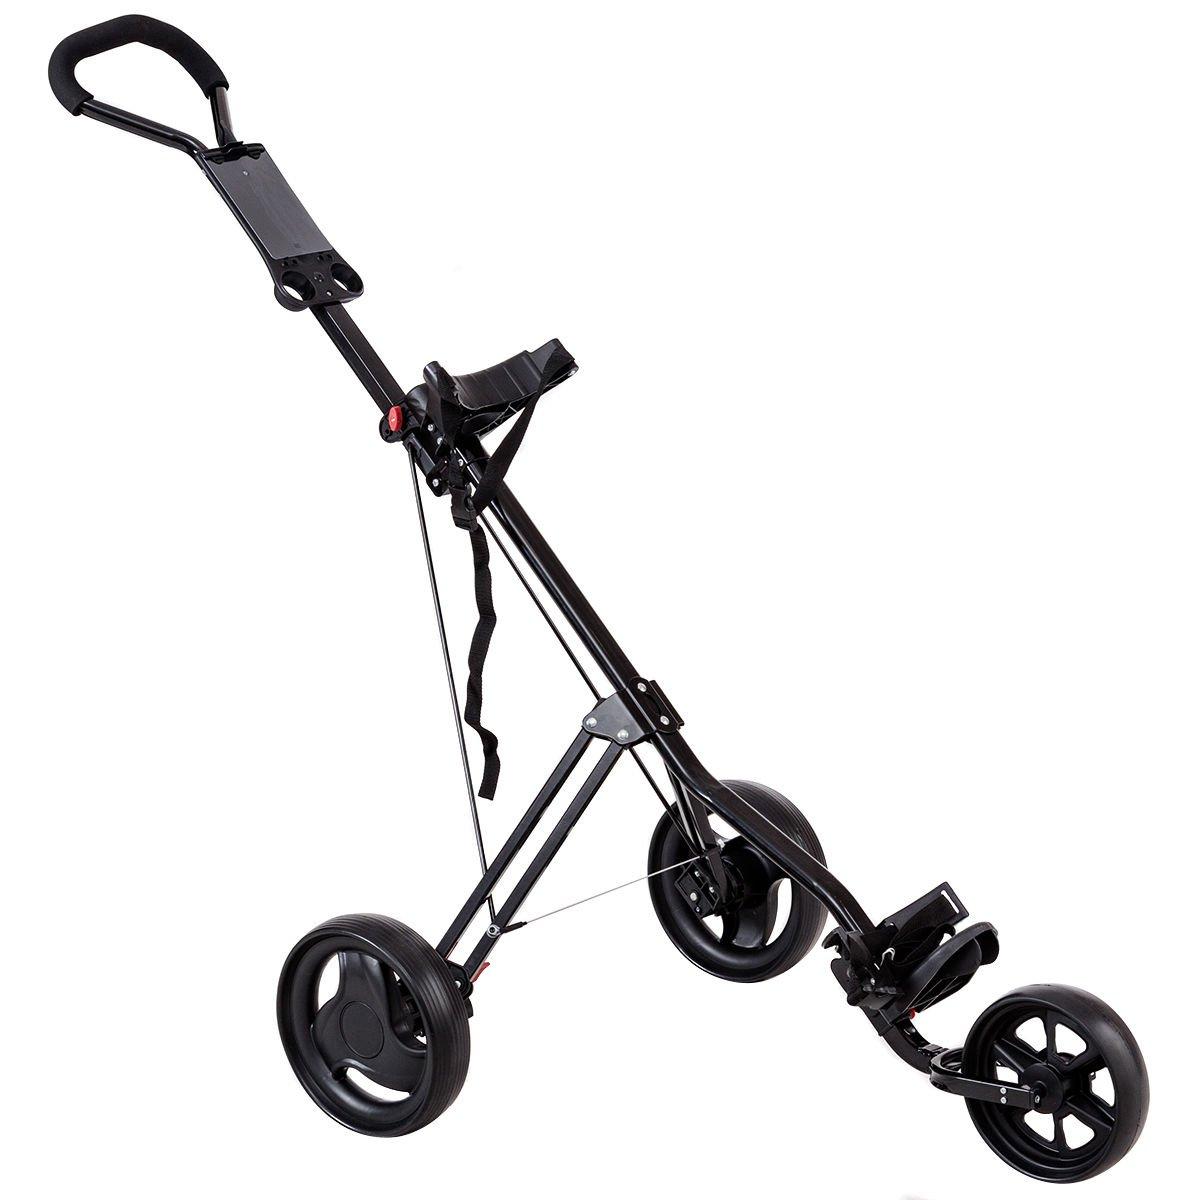 Tangkula Foldable Lightweight Wheels Trolley